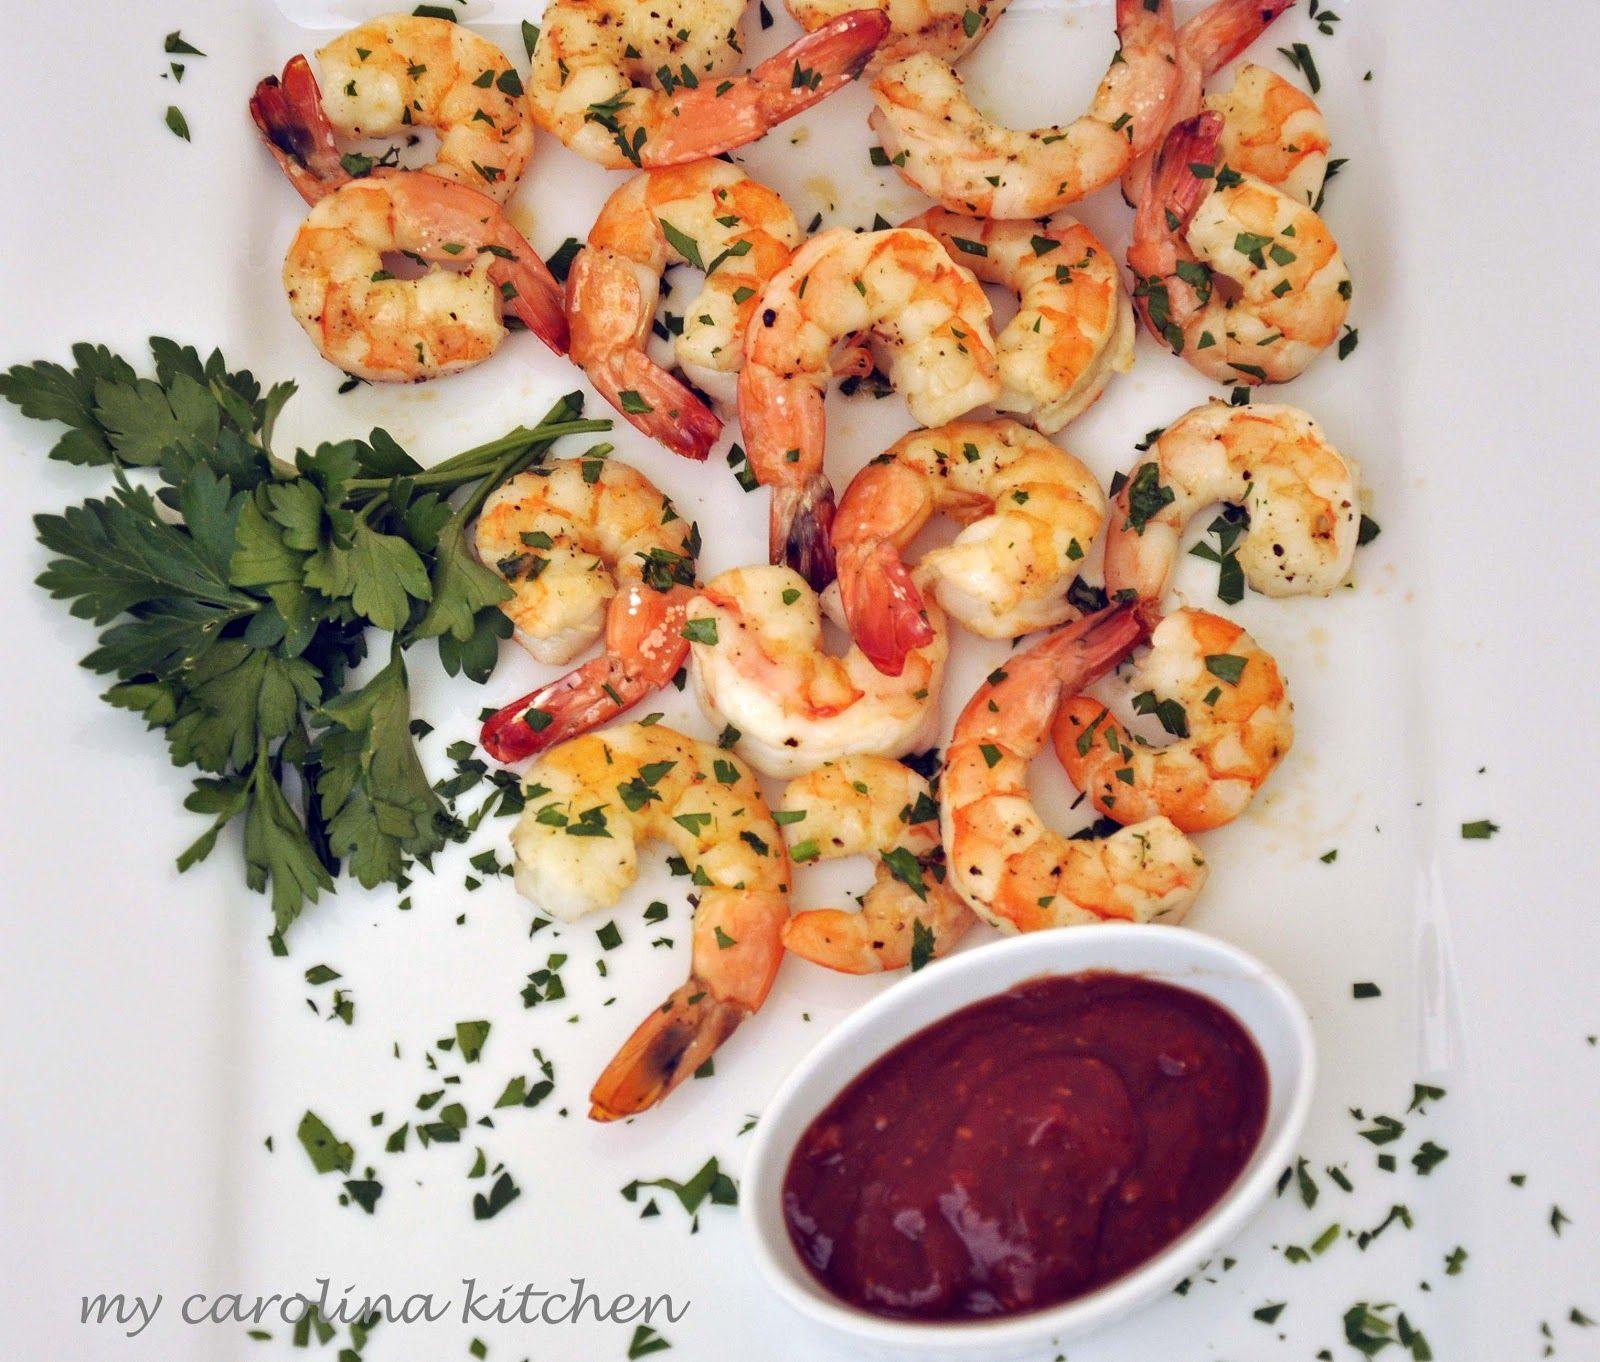 Roasted Shrimp Barefoot Contessa Carolina